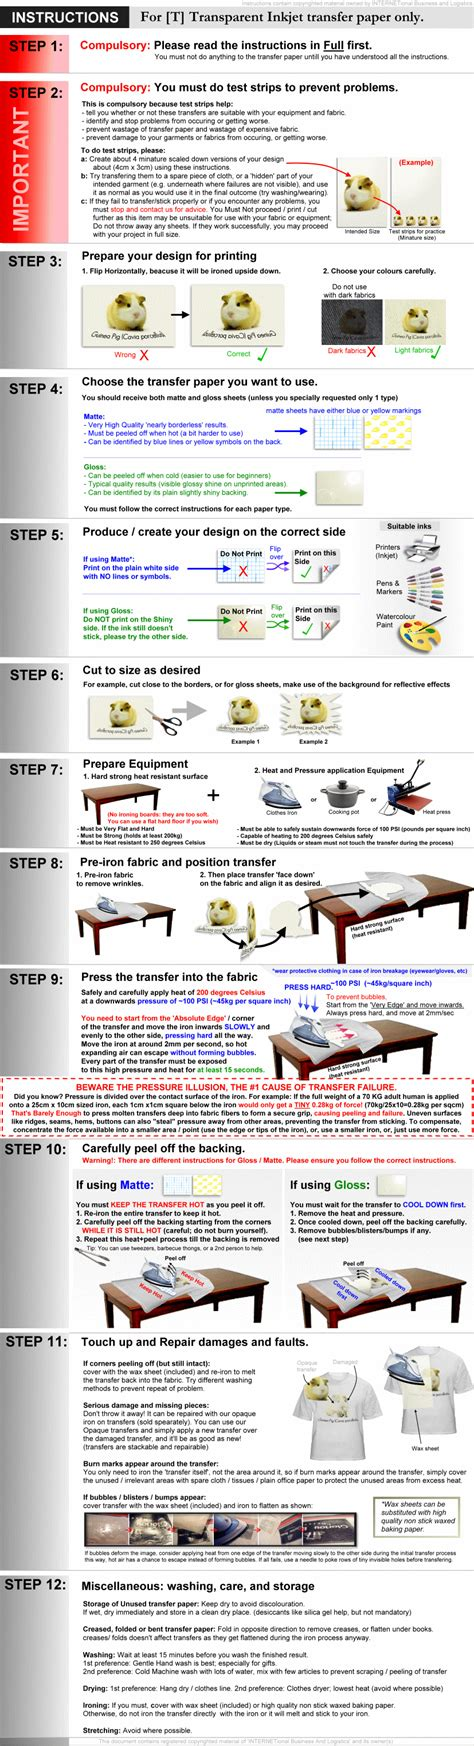 printable iron on transfer paper instructions t 10 sheets blank iron on heat transfer inkjet printer